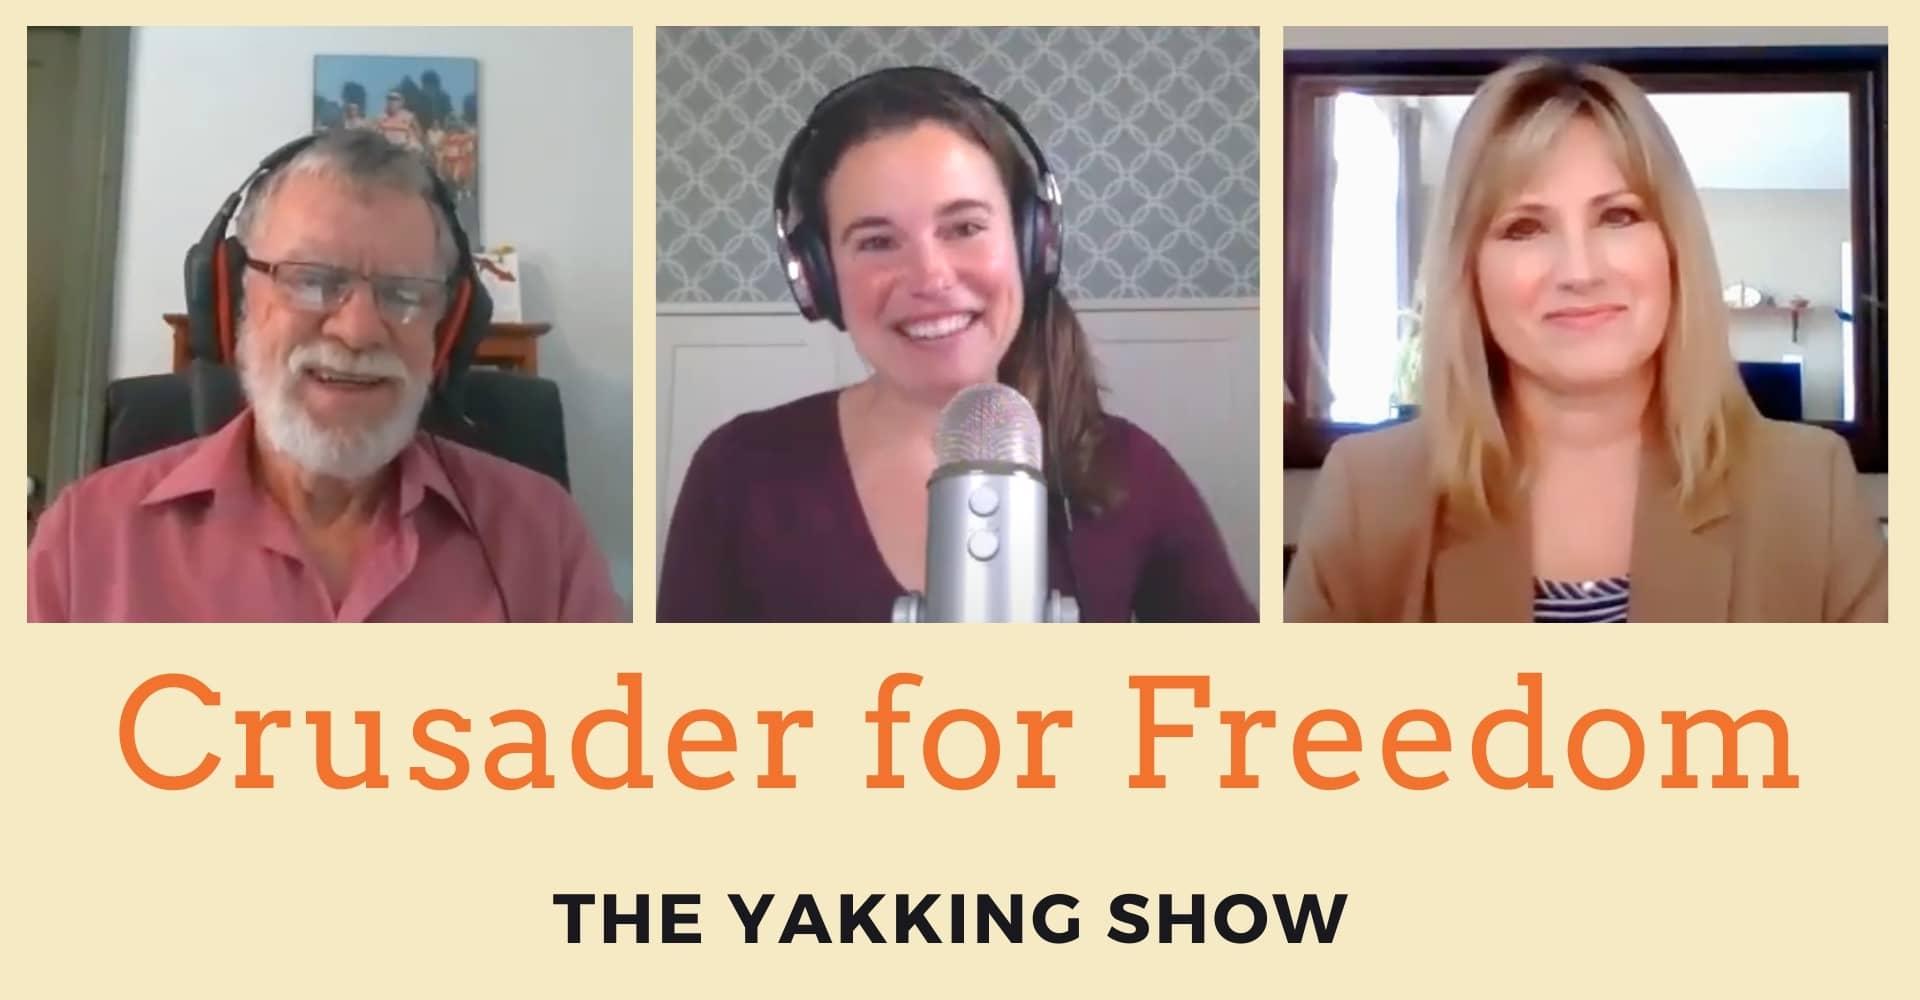 The Yakking Show Podcast Crusader for Freedom Peter Wright Kimberly Neudorf Kathleen Beauvais